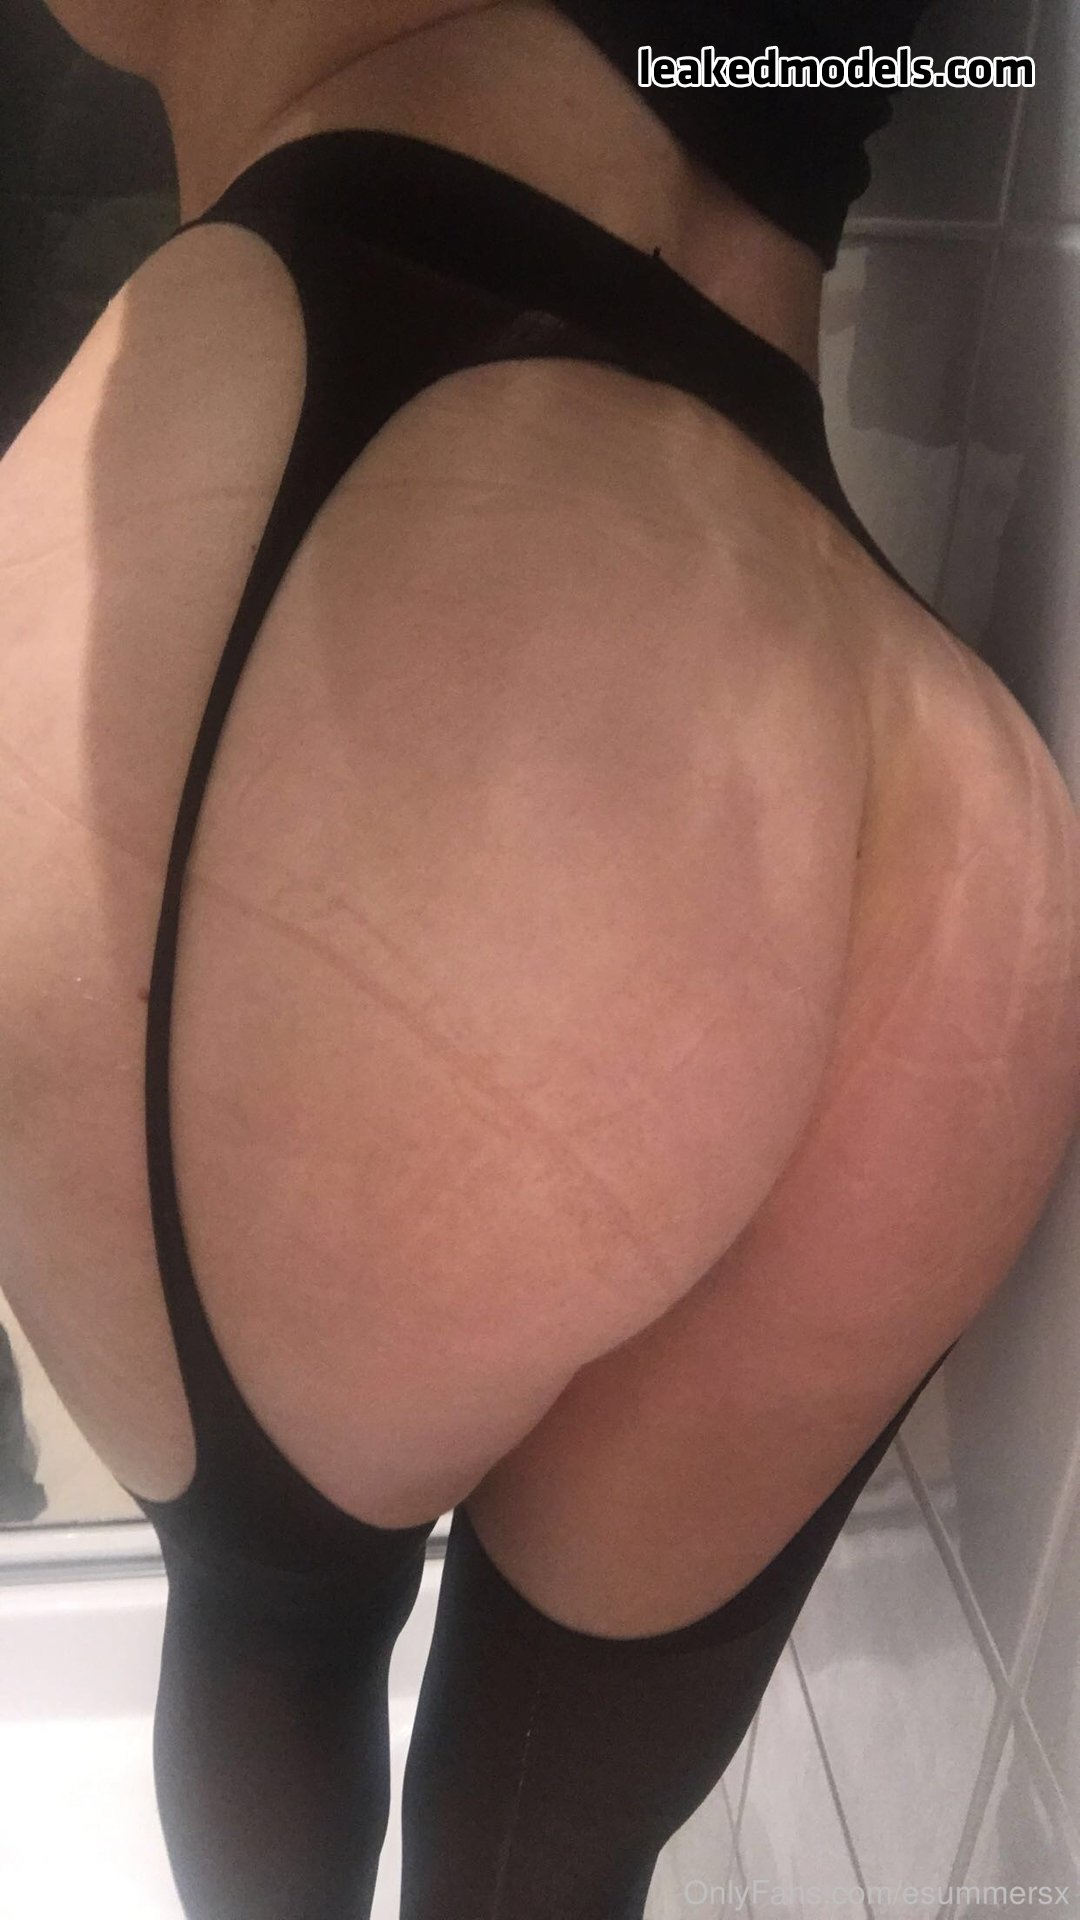 esummersx OnlyFans Nude Leaks (30 Photos)